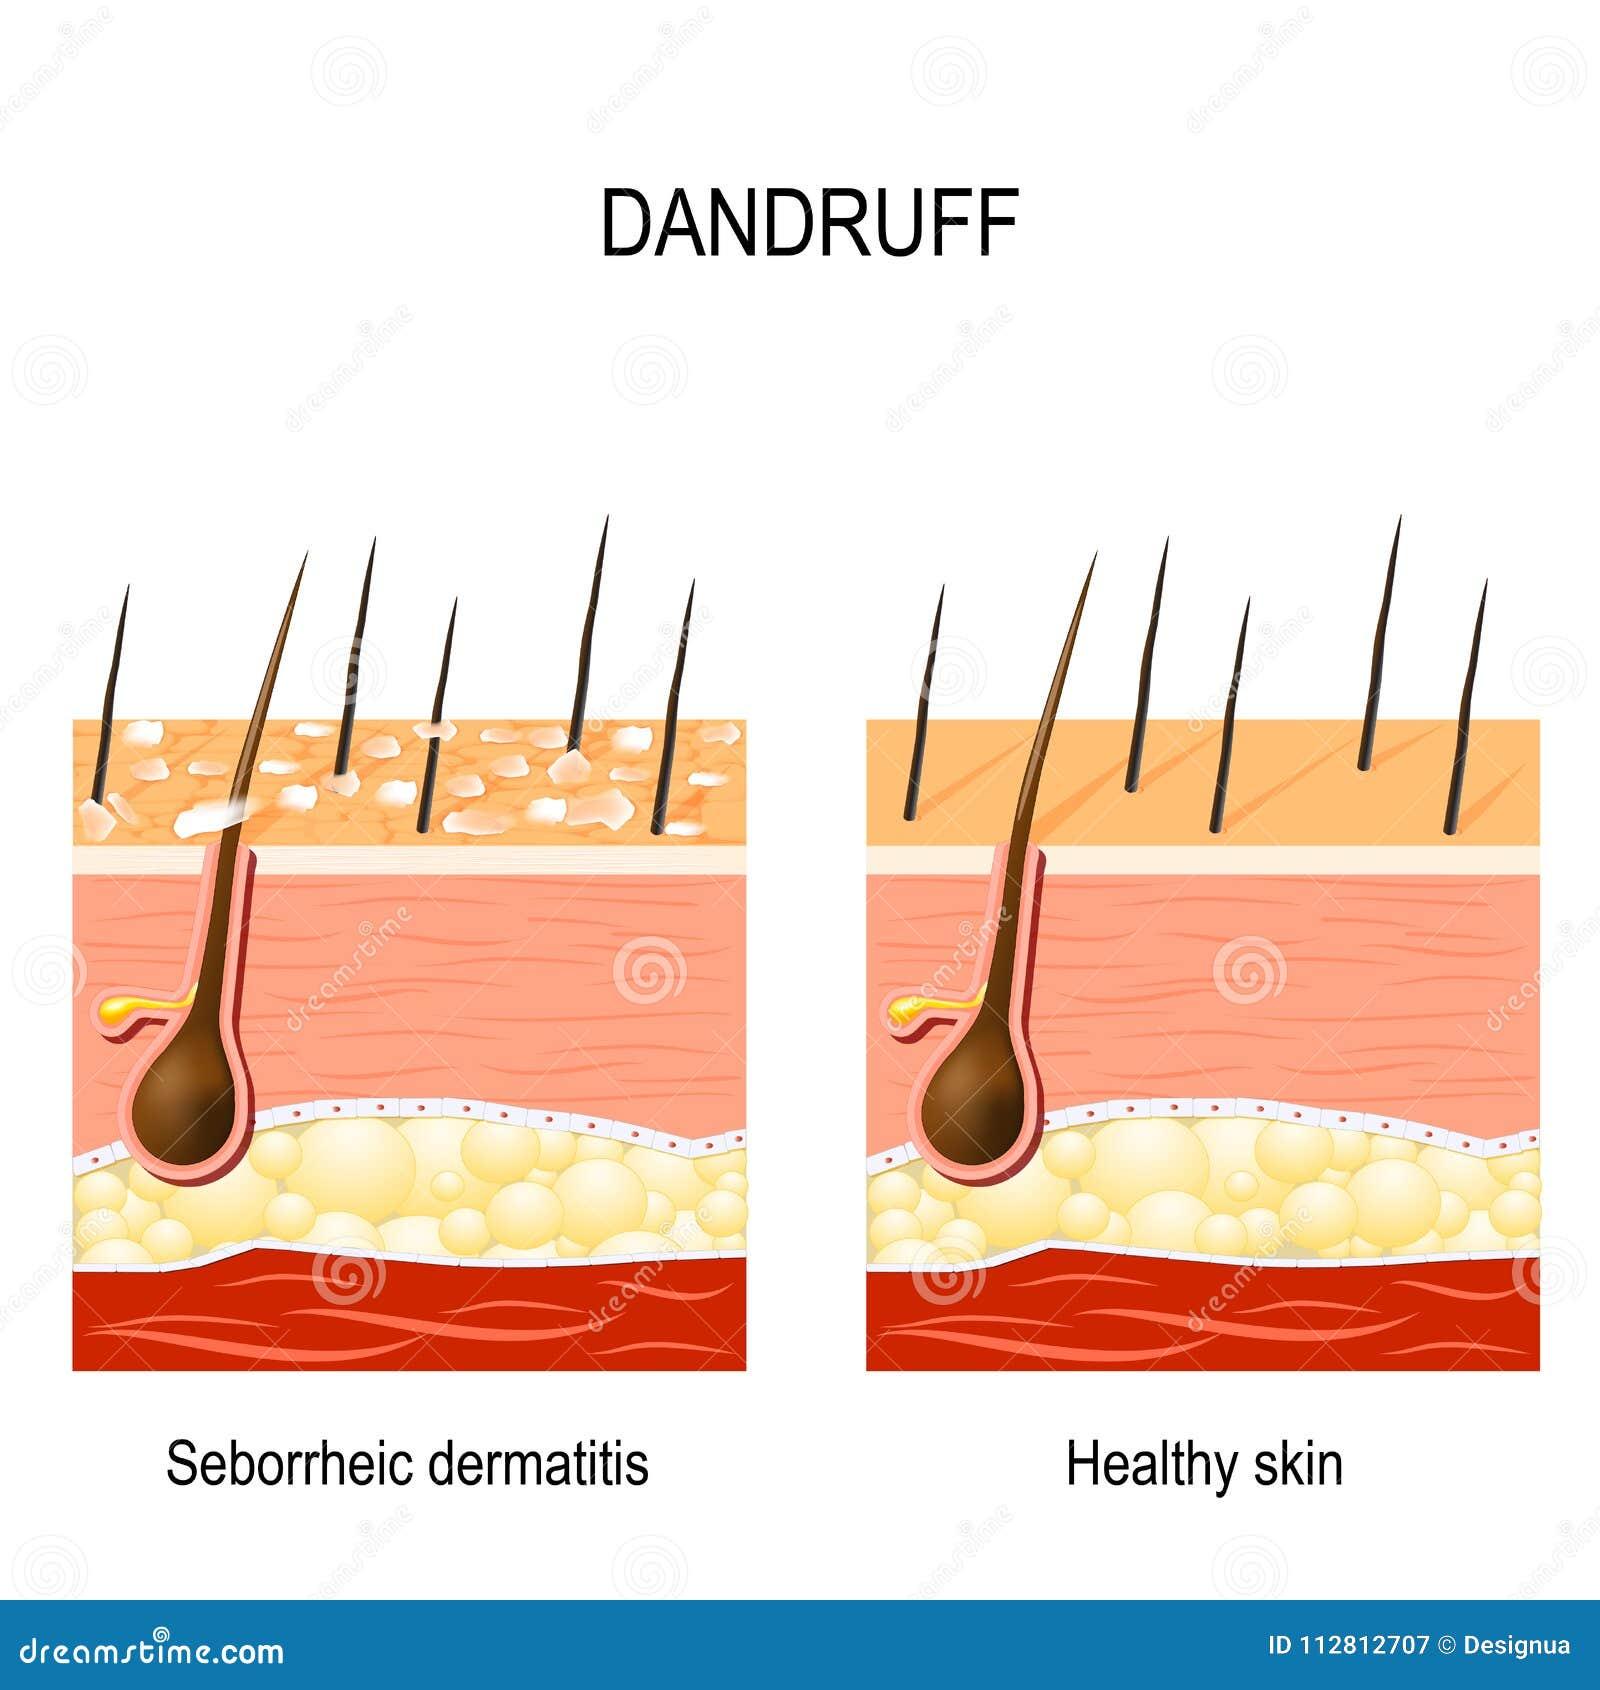 Dandruff dermatite seborrheic